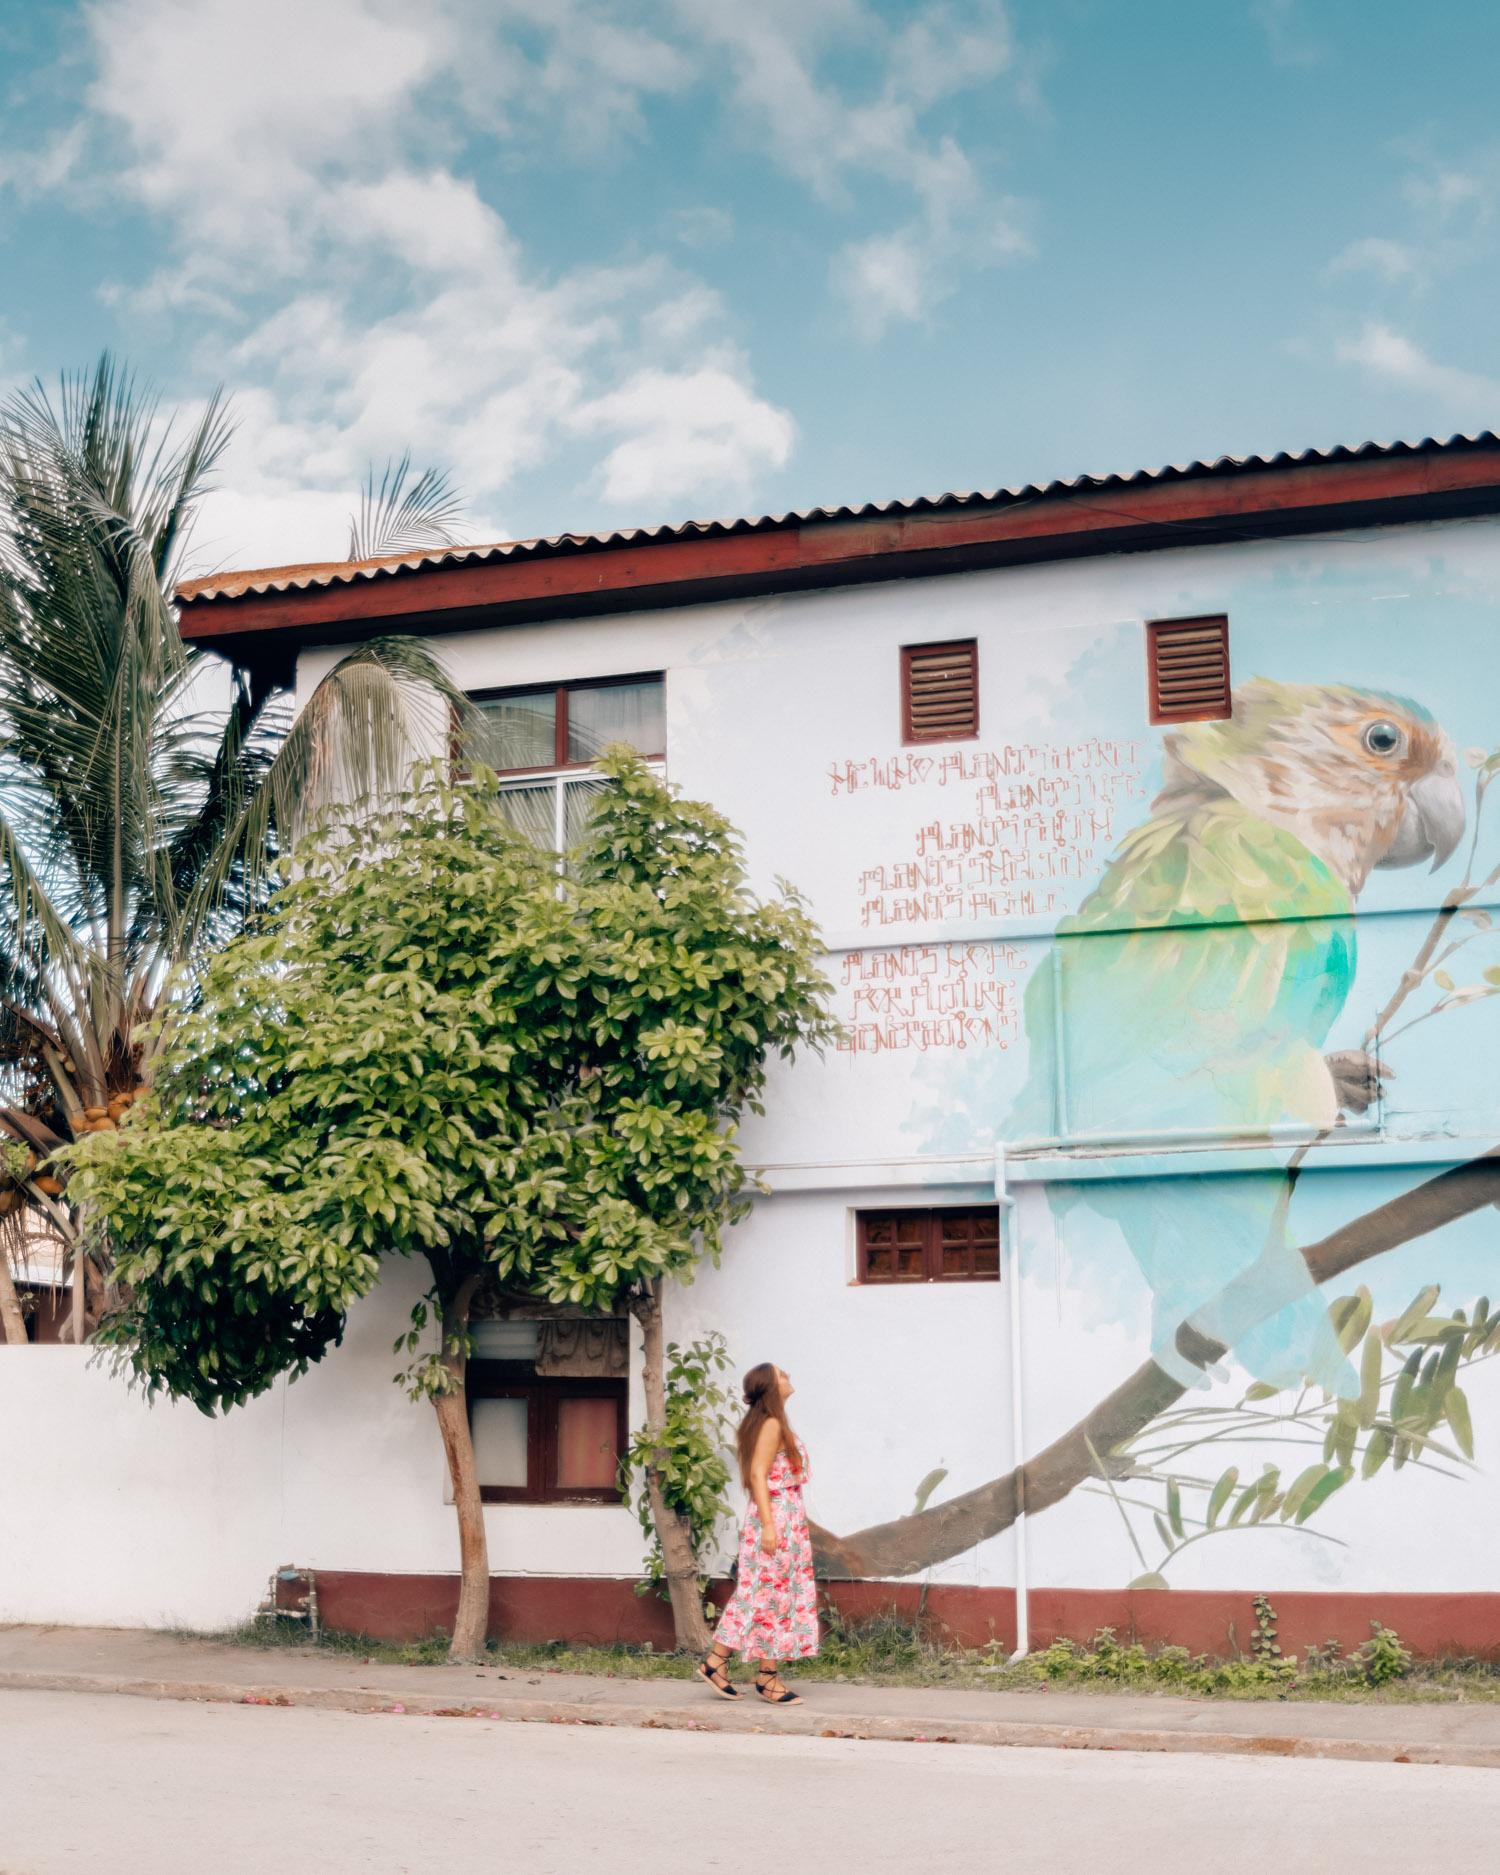 Street Art in San Nicolas |Things to do in Aruba